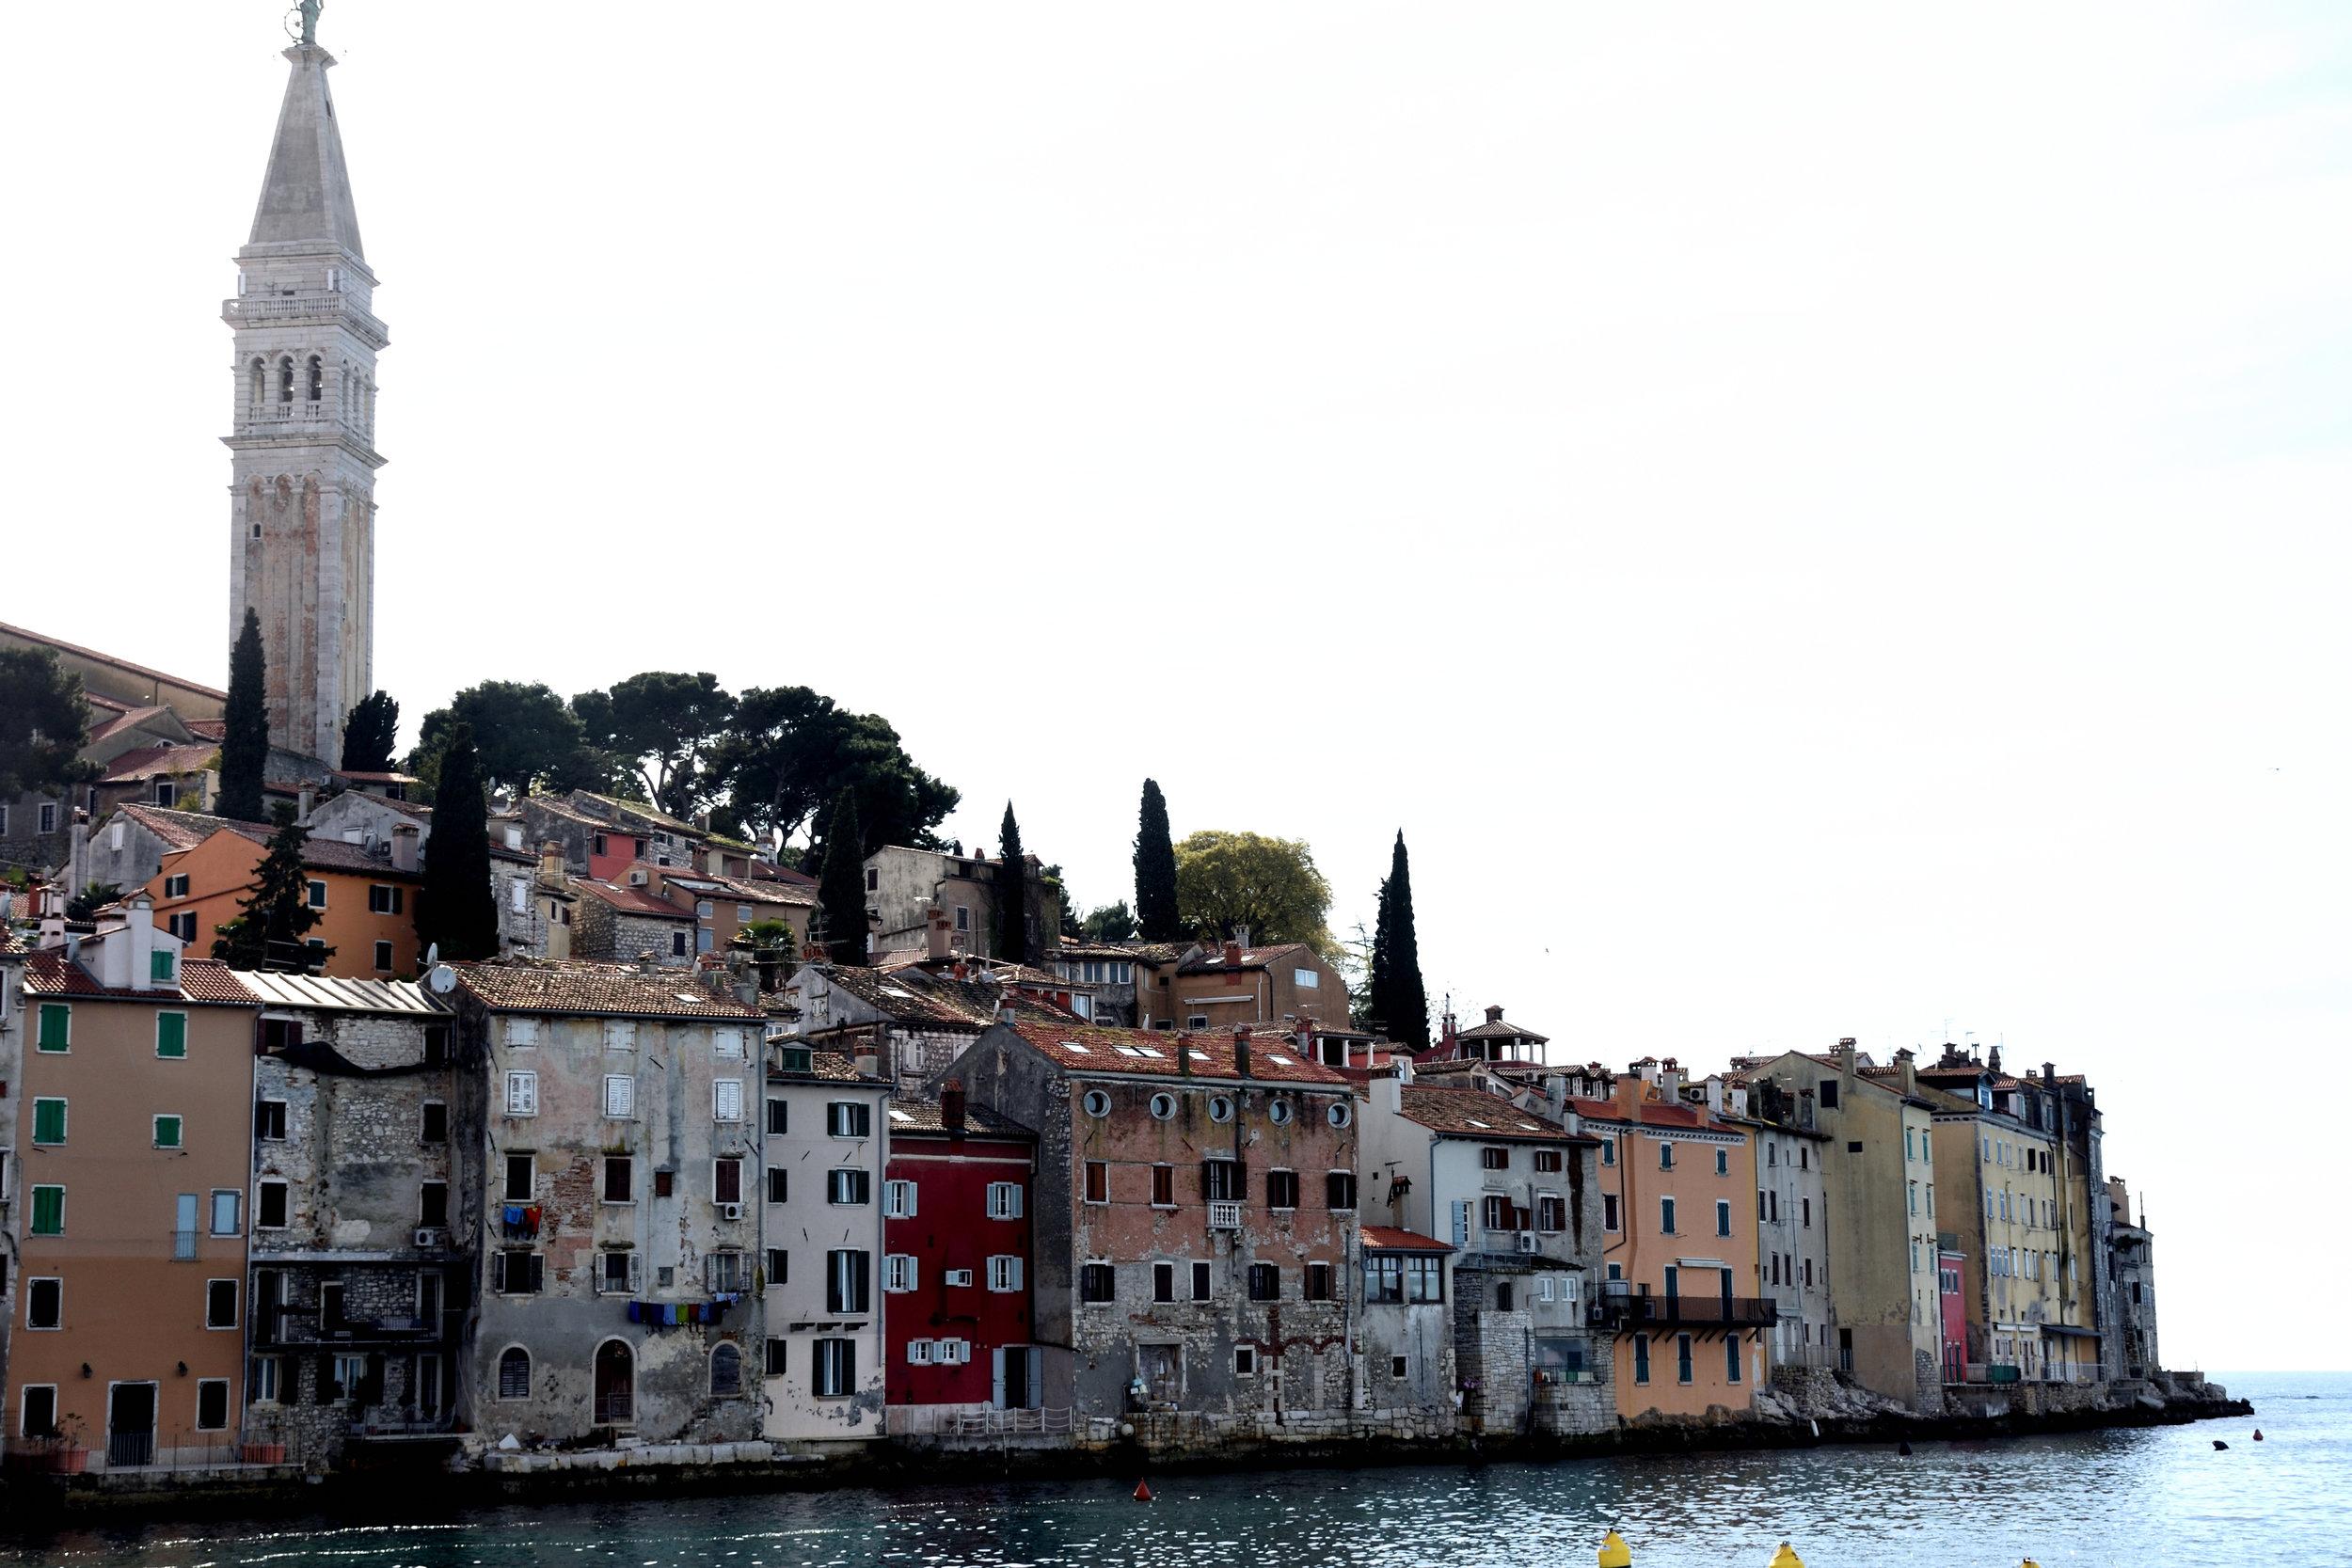 Rovinj, Croatia, April 2018